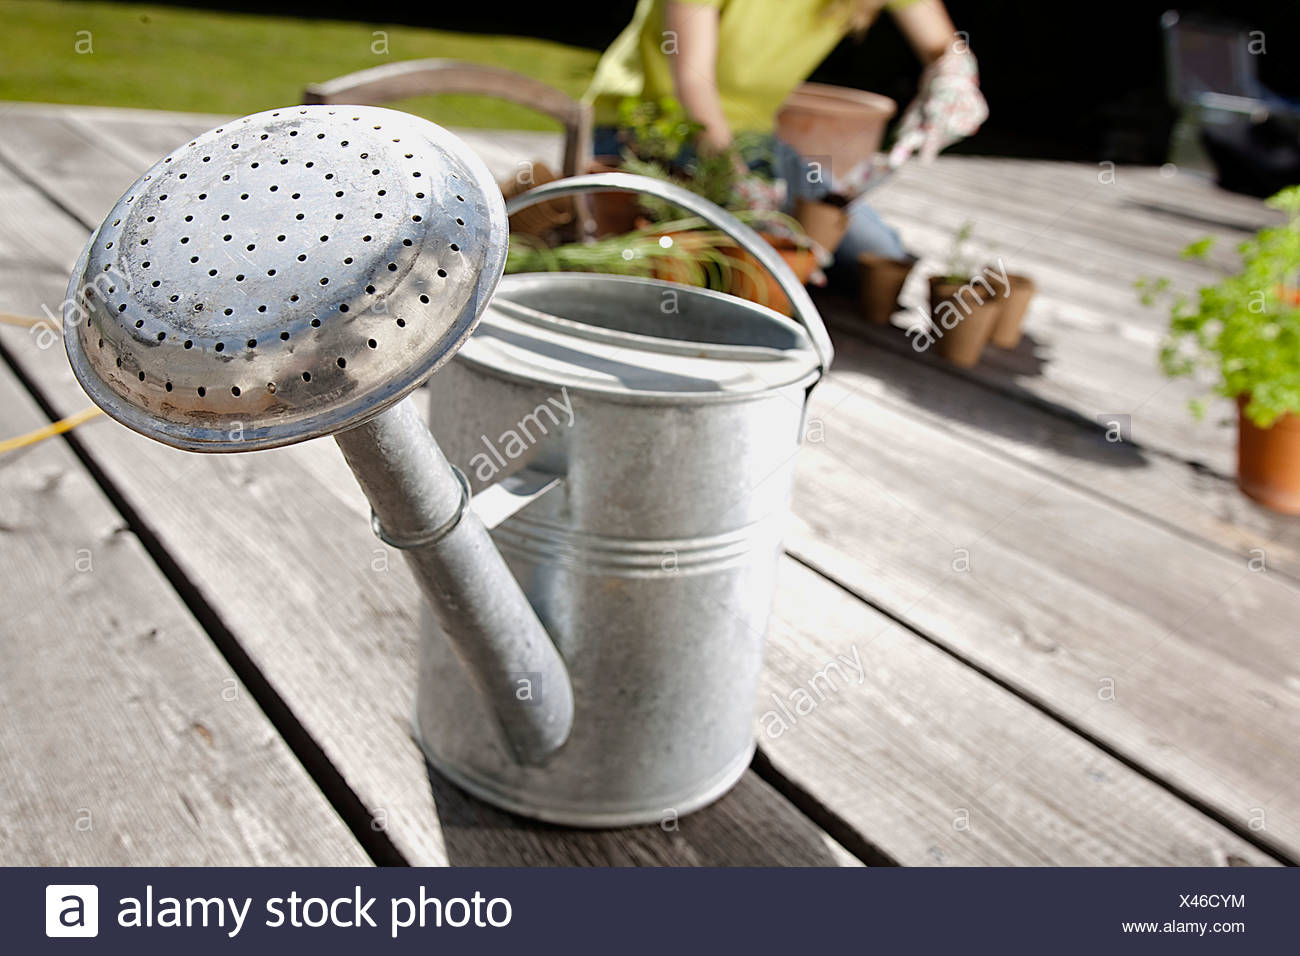 silver watering can on veranda - Stock Image